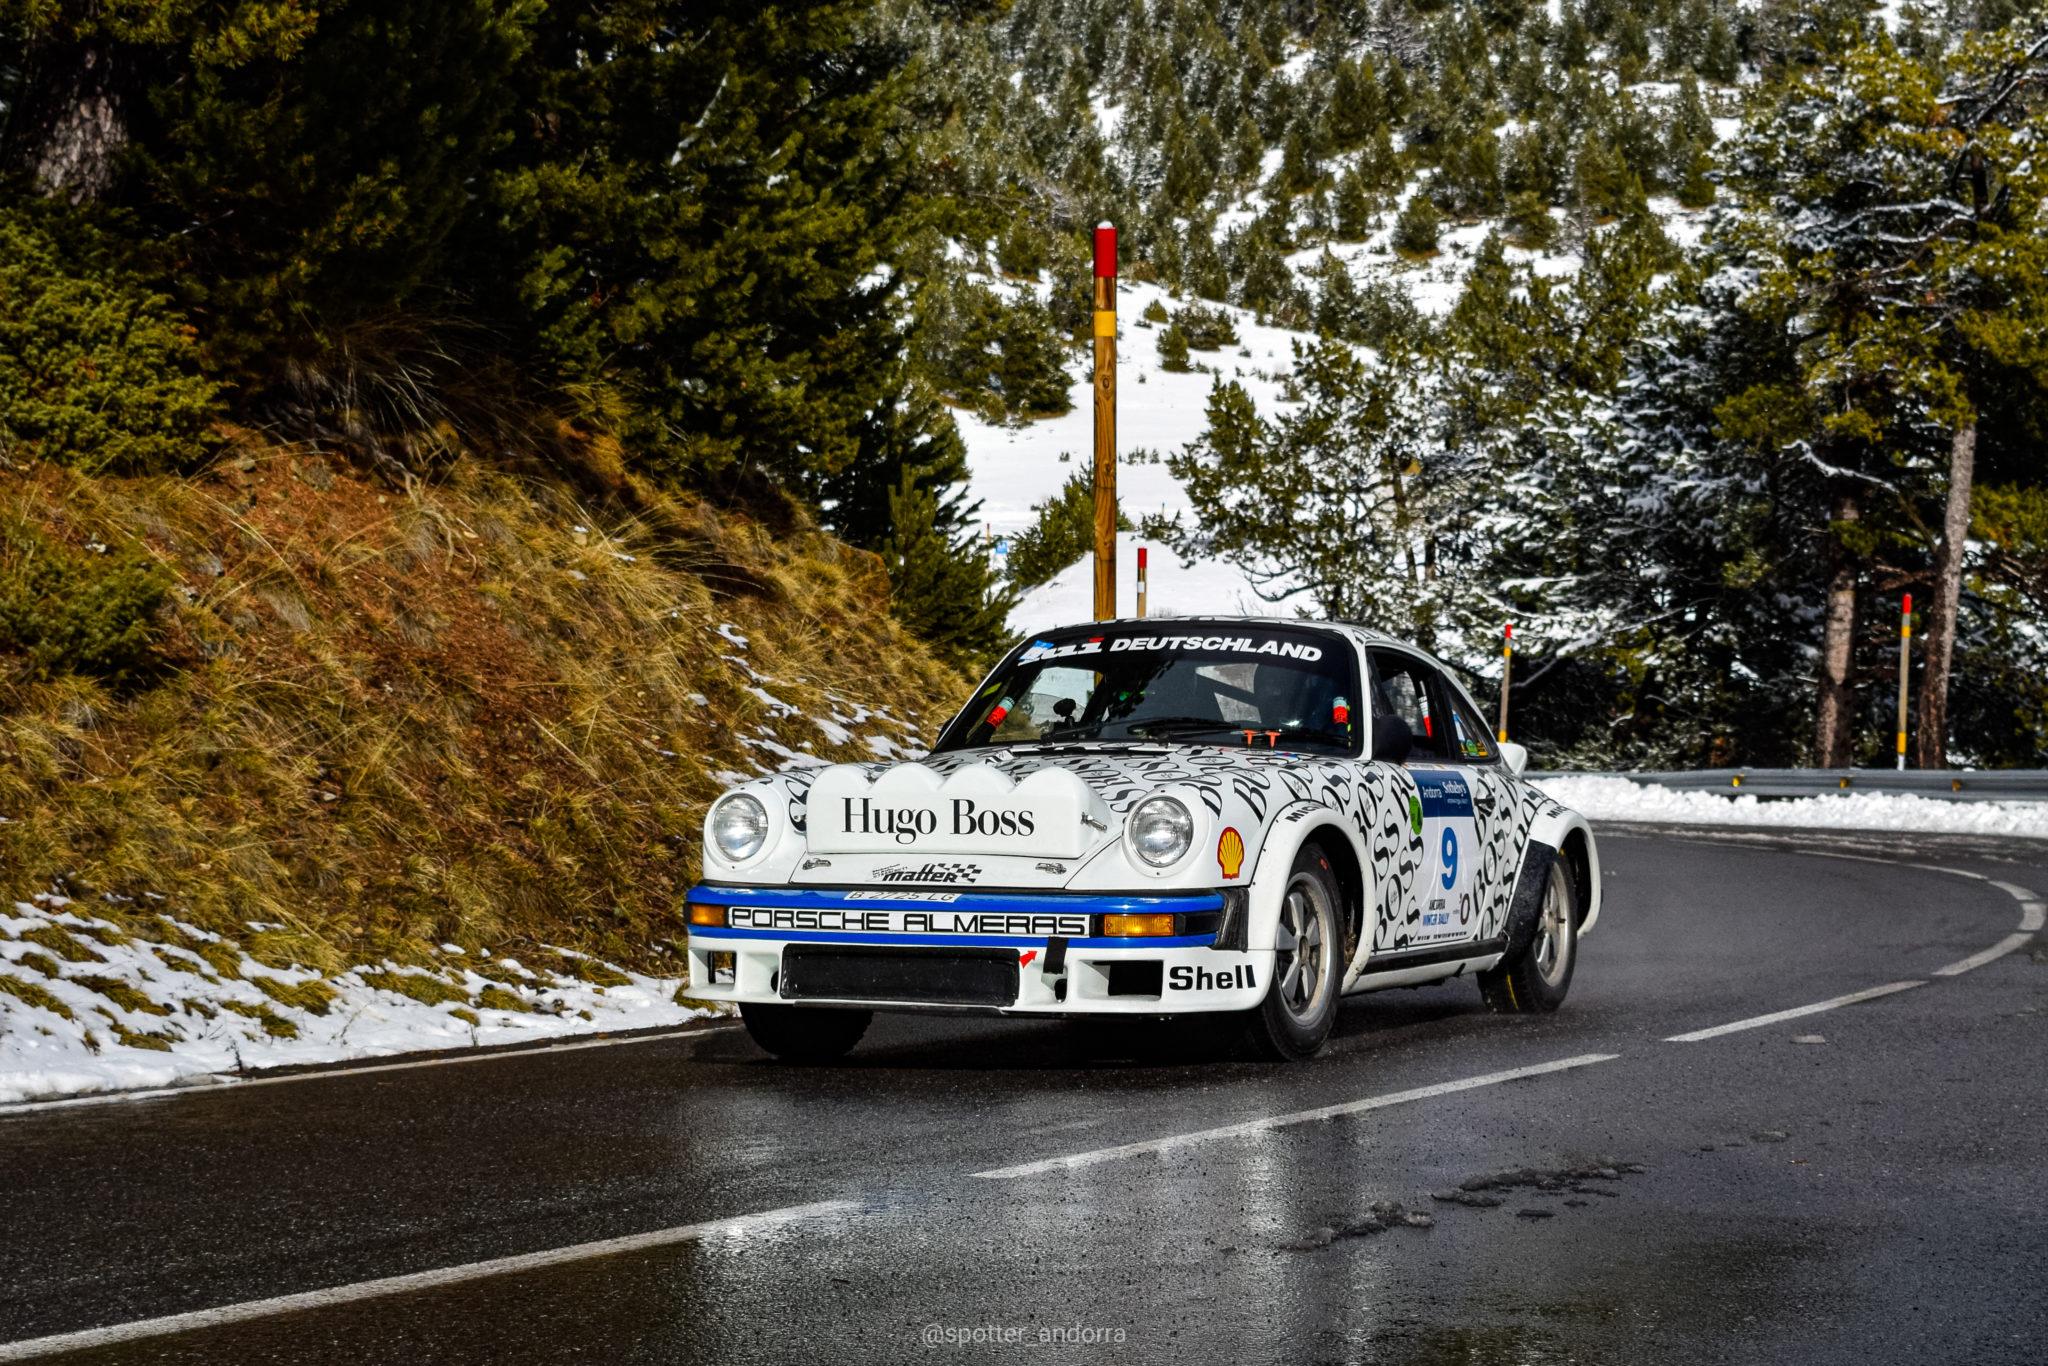 Fotografía del Car Spotter Ds-photocars del Porsche Classic Series organizado por Rallyclassic en Andorra